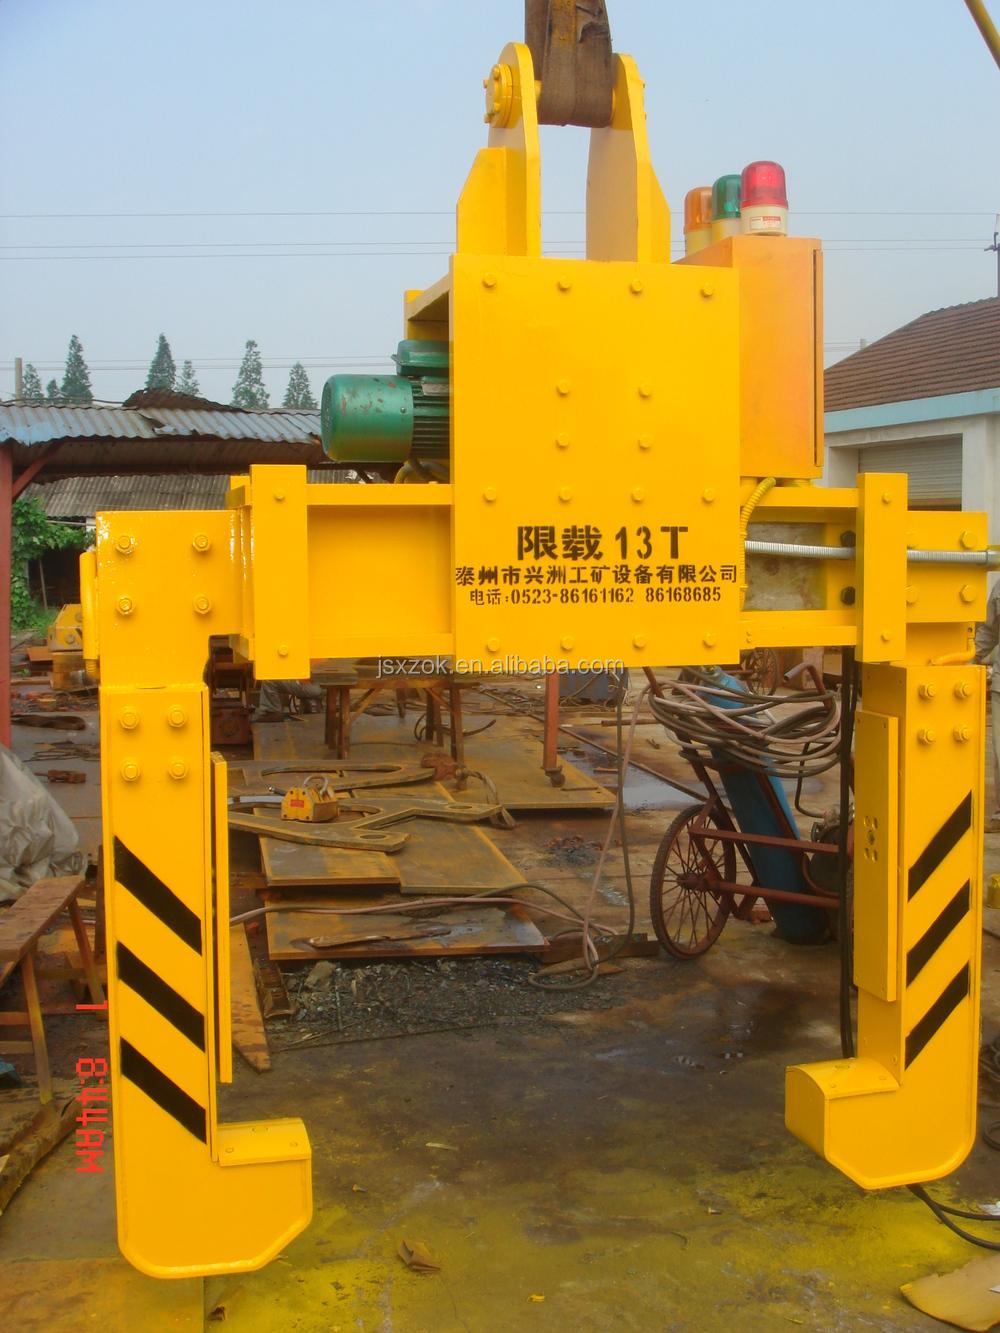 Electrical Steel Coils : Electrical steel coil lifter buy lifters